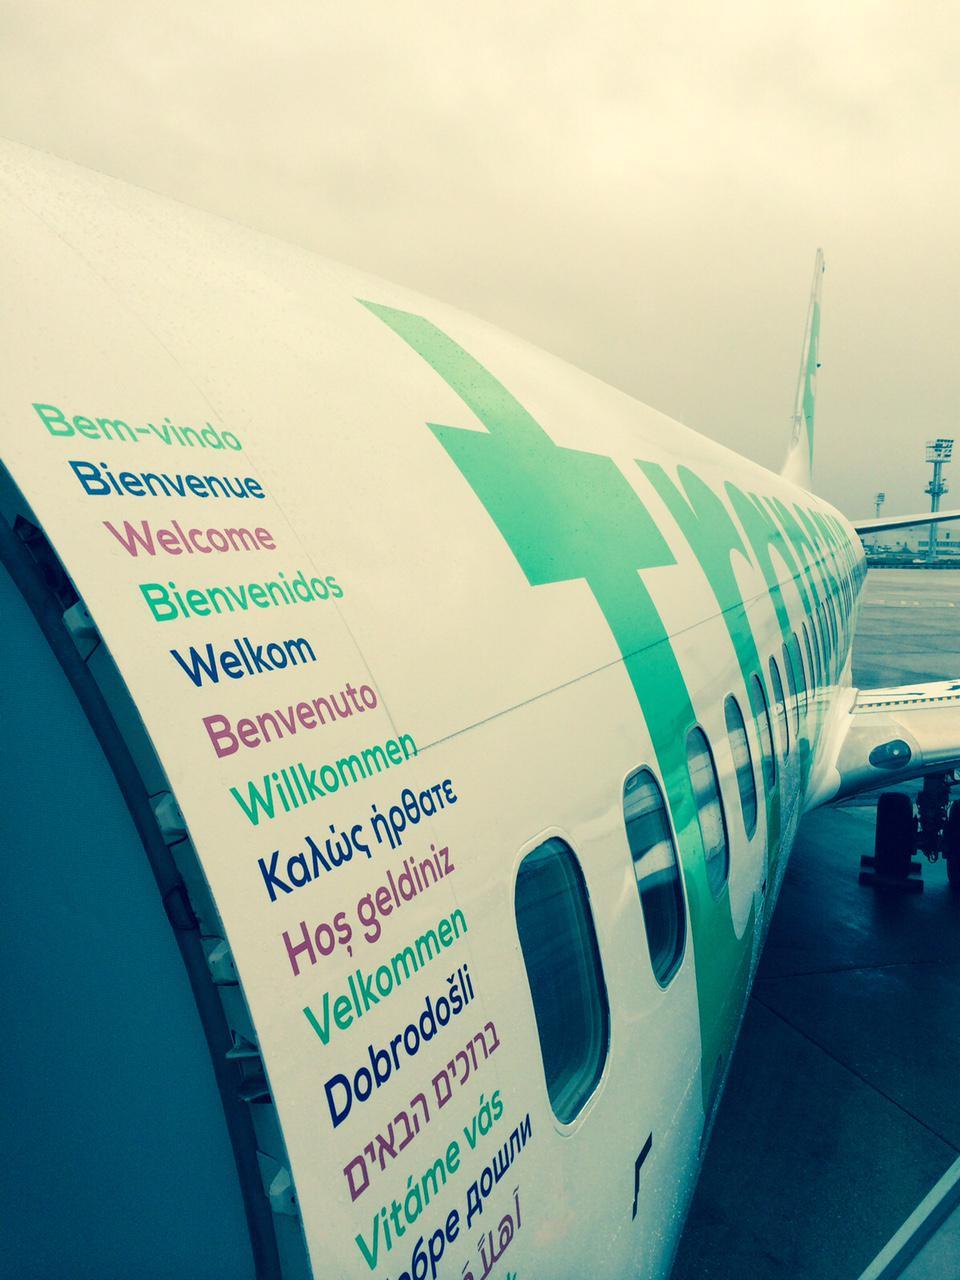 brand new  new logo  identity  and livery for transavia by studio dumbar